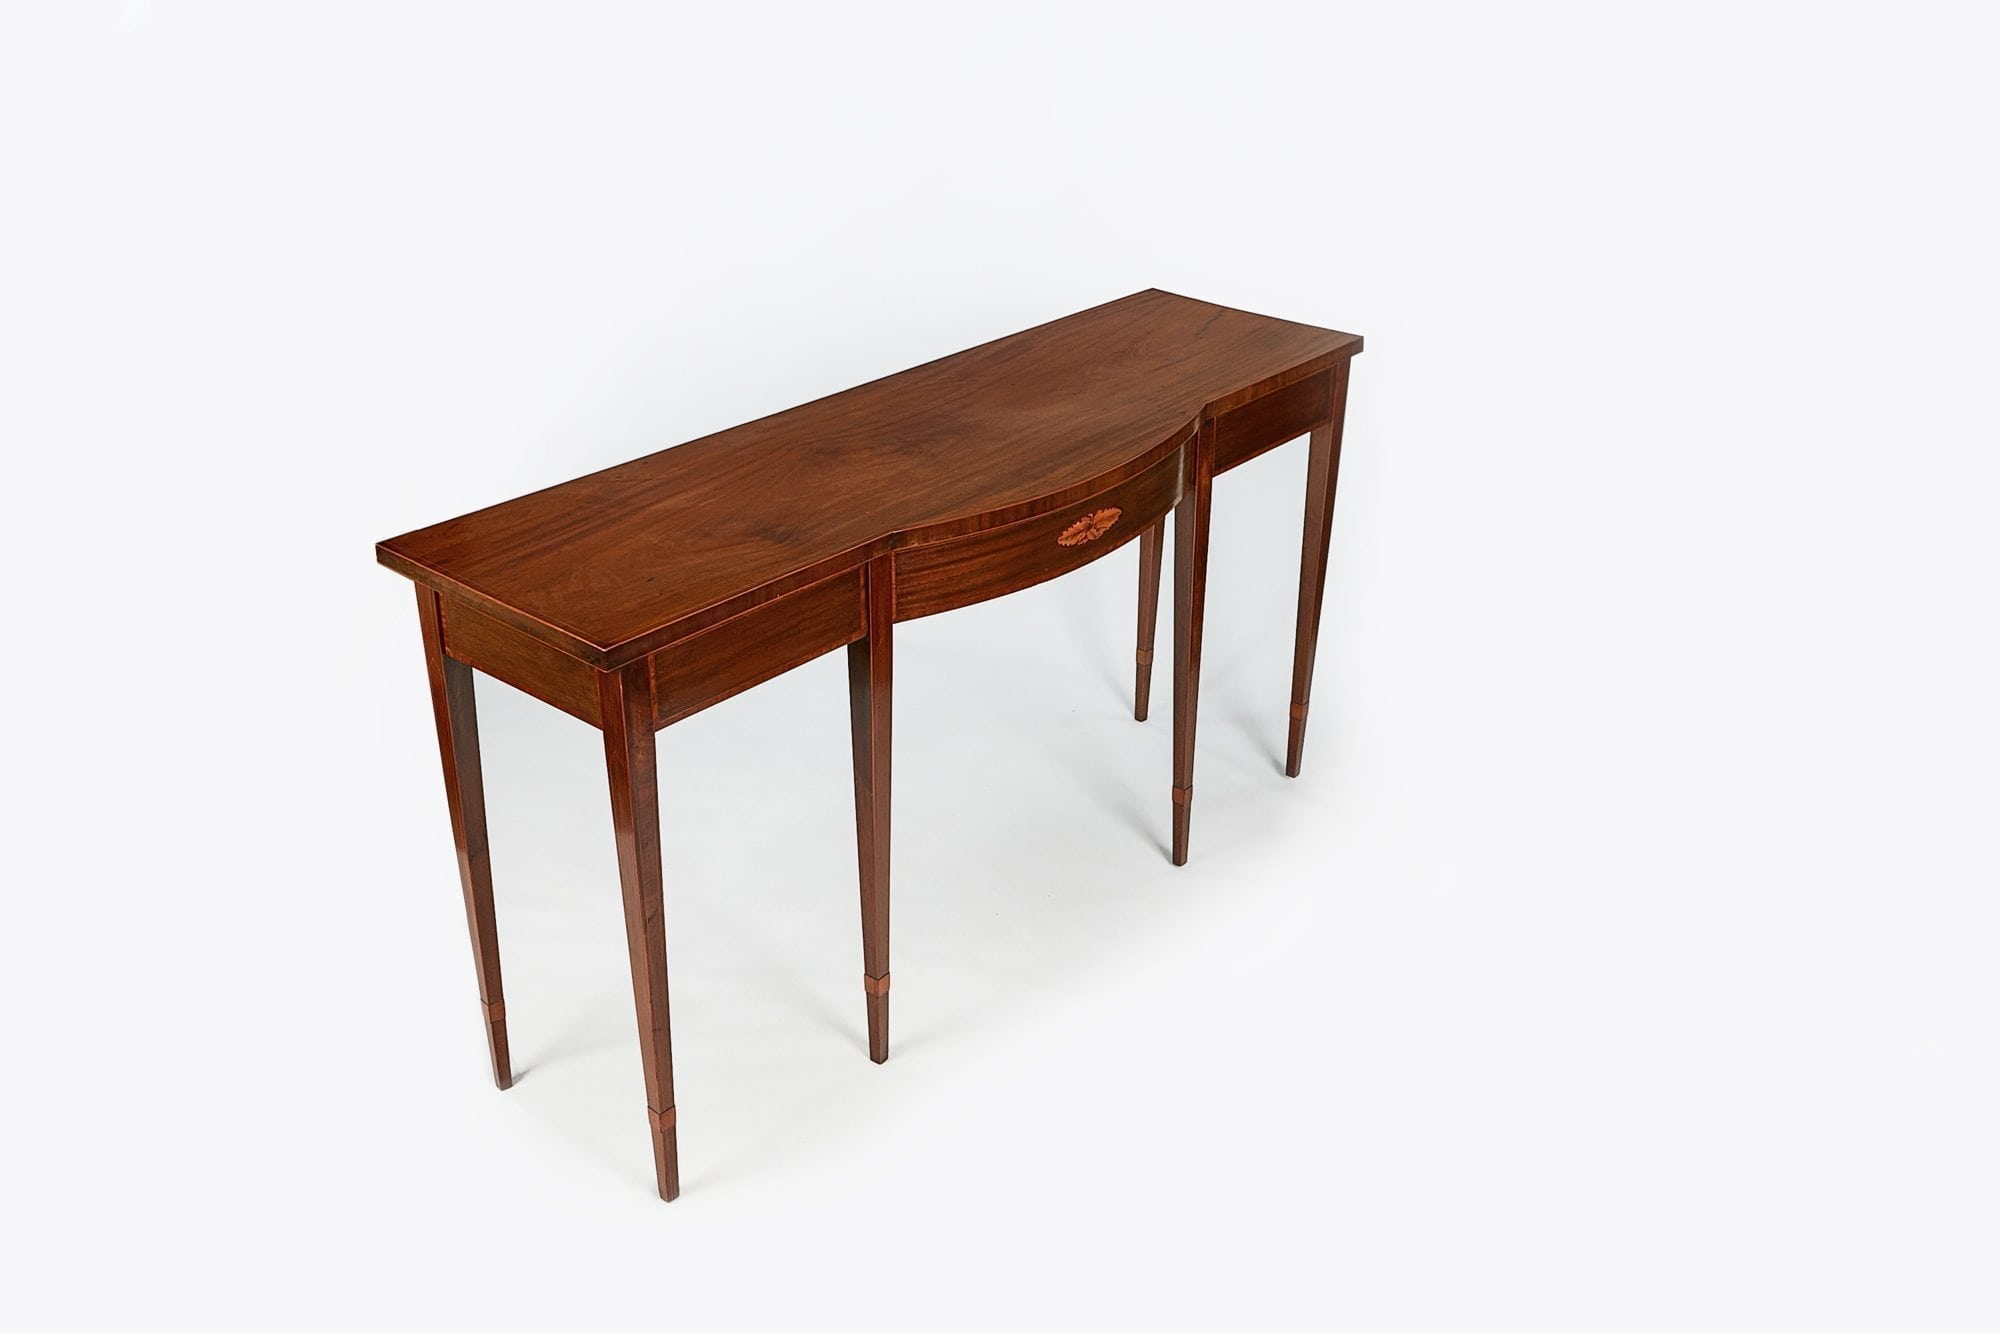 ... 10204   Early 19th Century Regency Satinwood Side Table After Adams